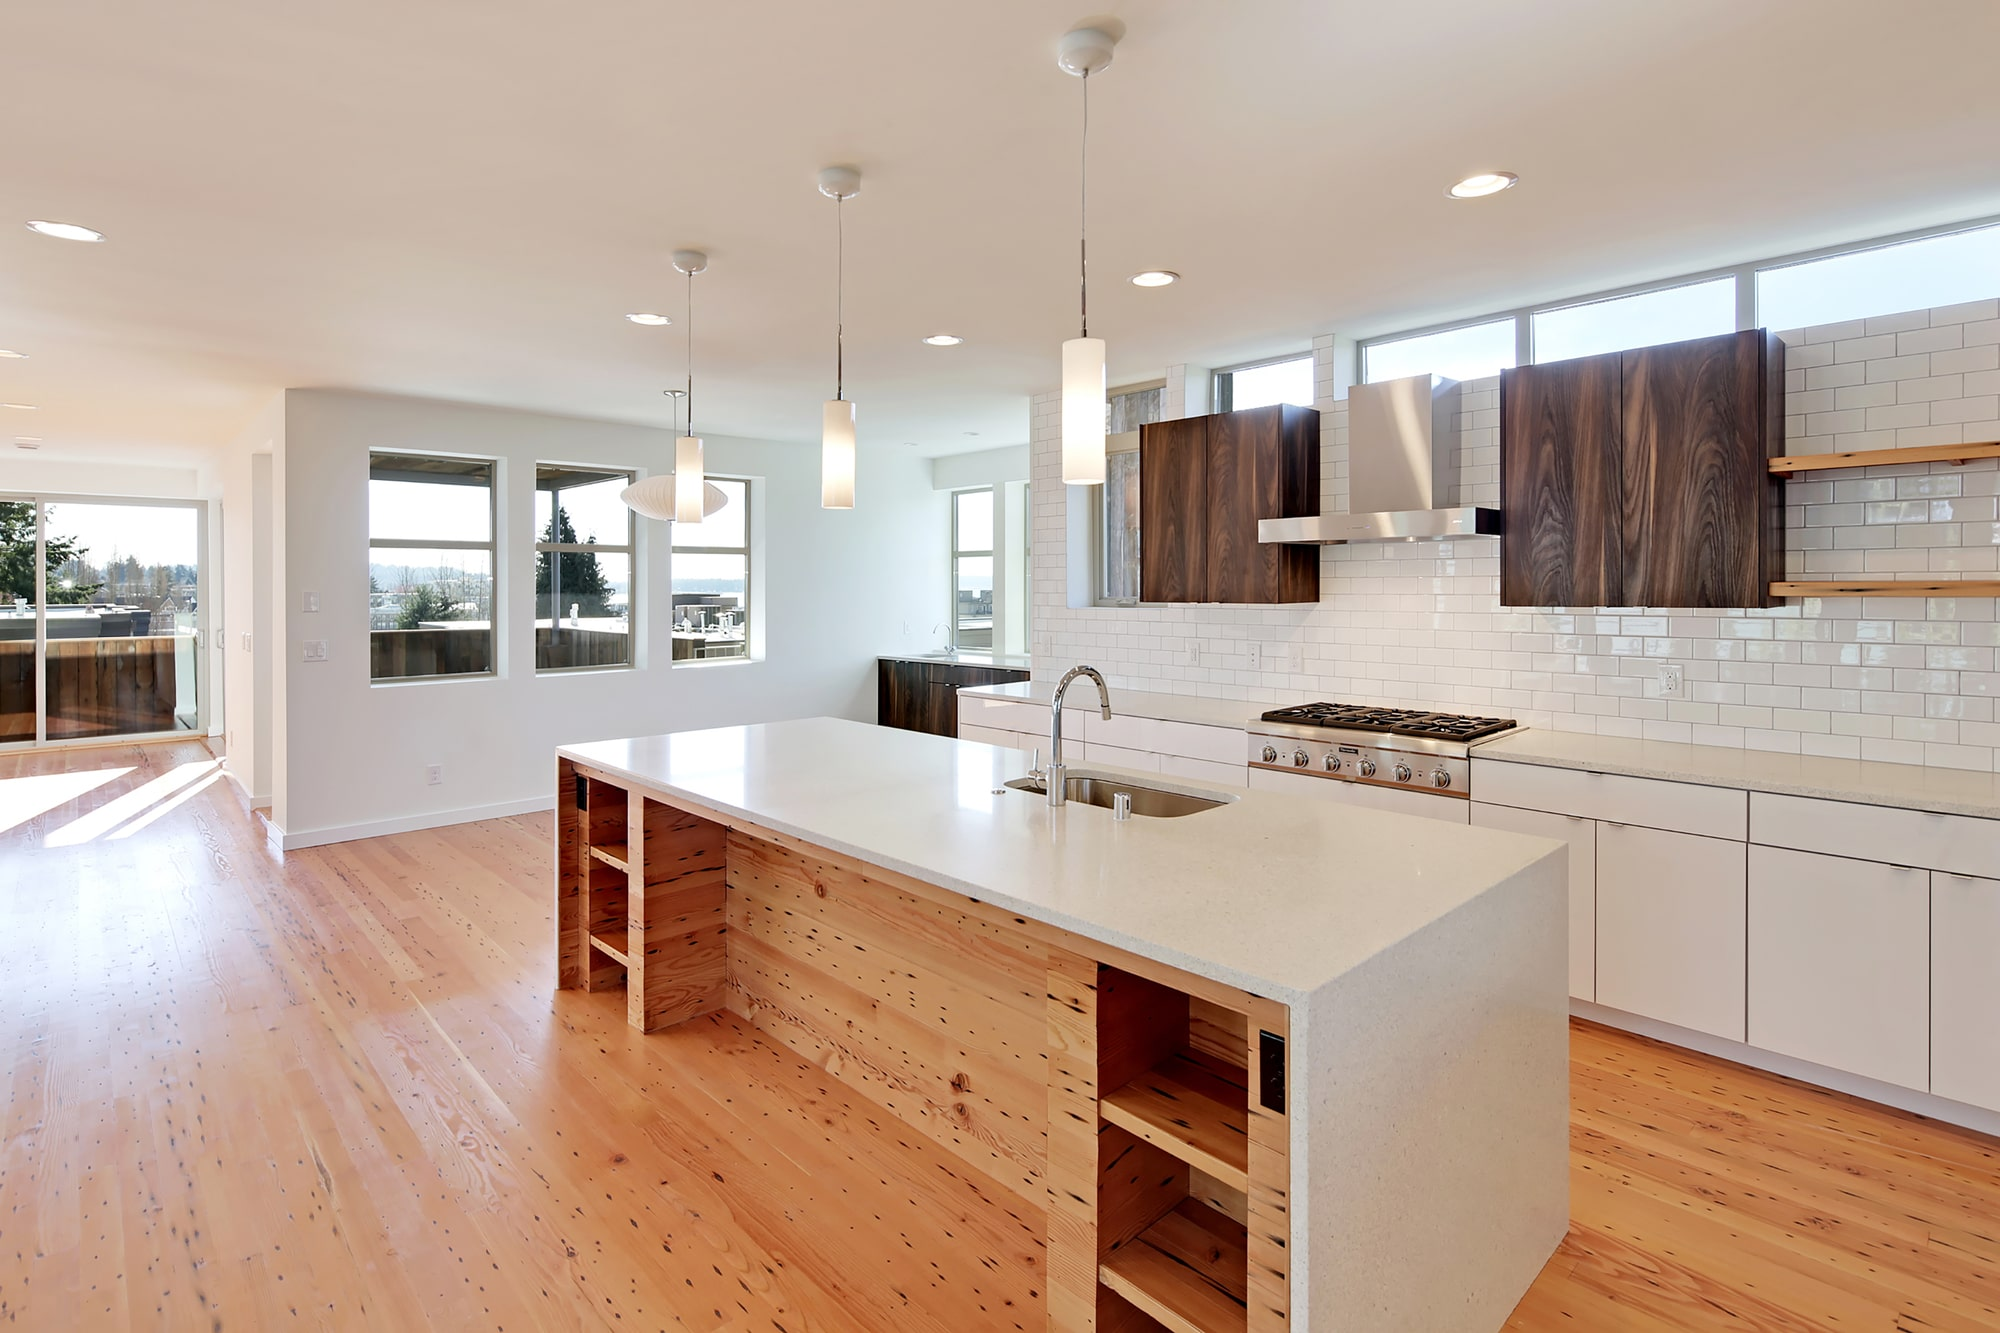 Dise o casa ecol gica autosuficiente planos construye - Cocinas con encimeras de madera ...